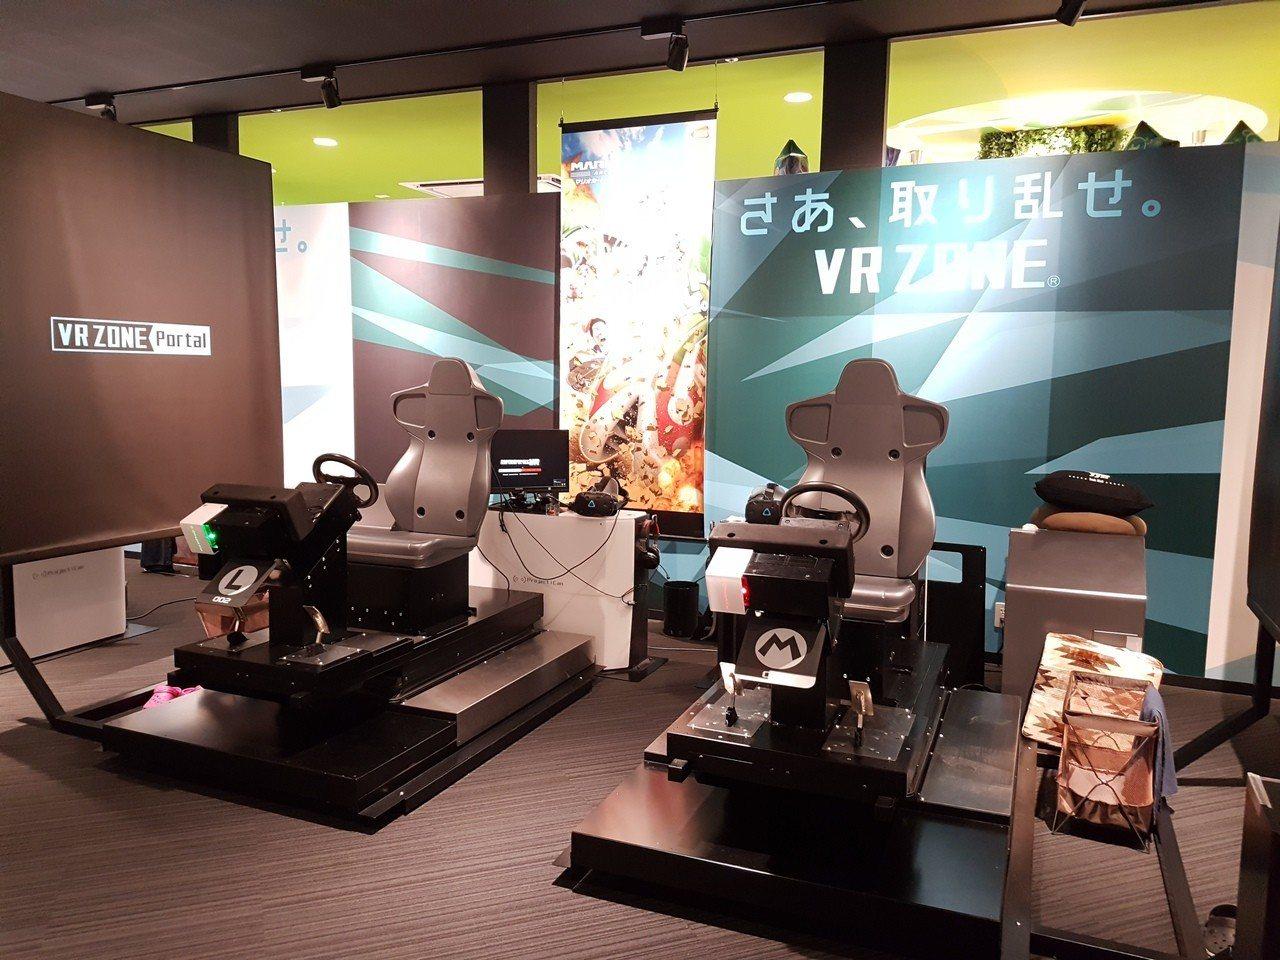 MARK IS內可預約VR實境互動遊戲體驗。記者何雅玲╱攝